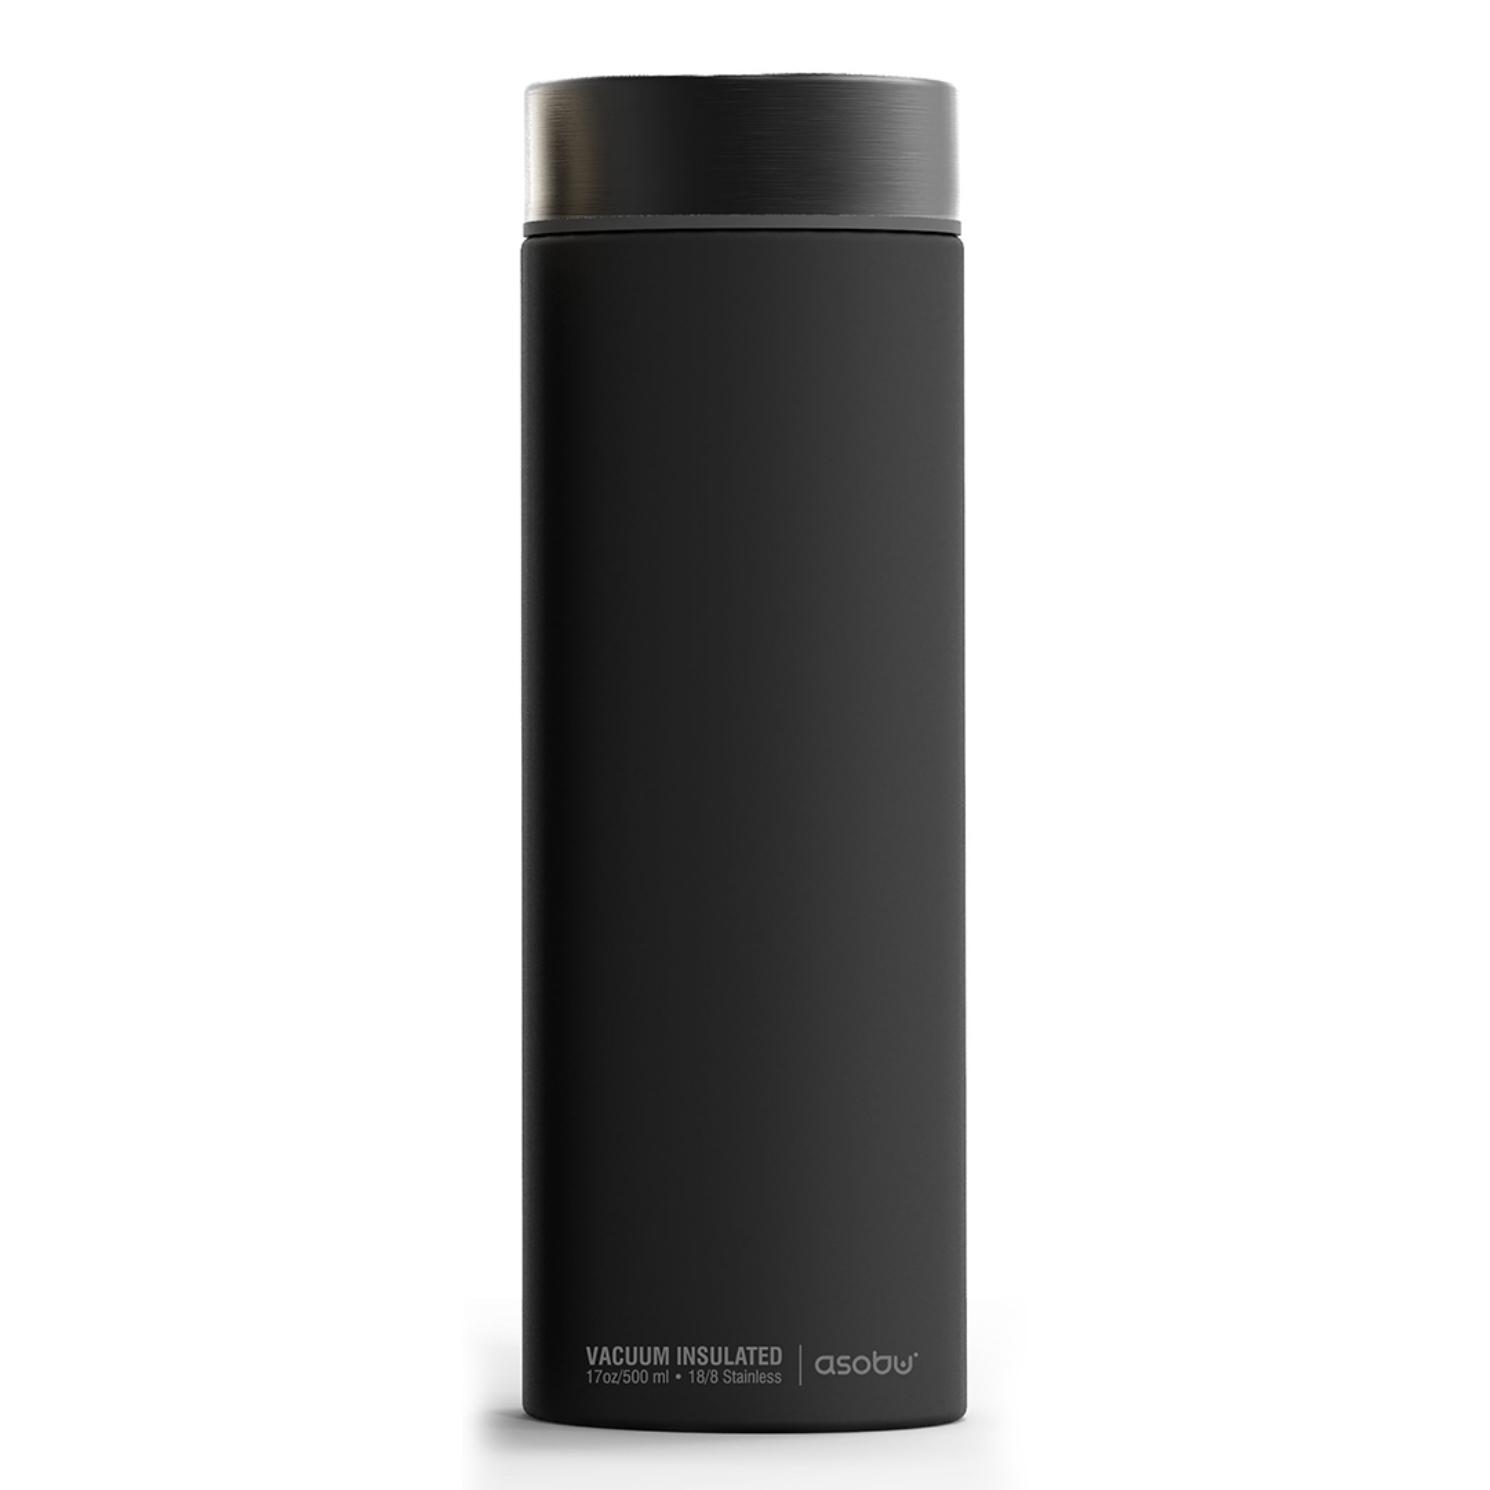 Онлайн каталог PROMENU: Термос Asobu LE BATON, 0,5 л, темно-серый Asobu LB17 SMOKE